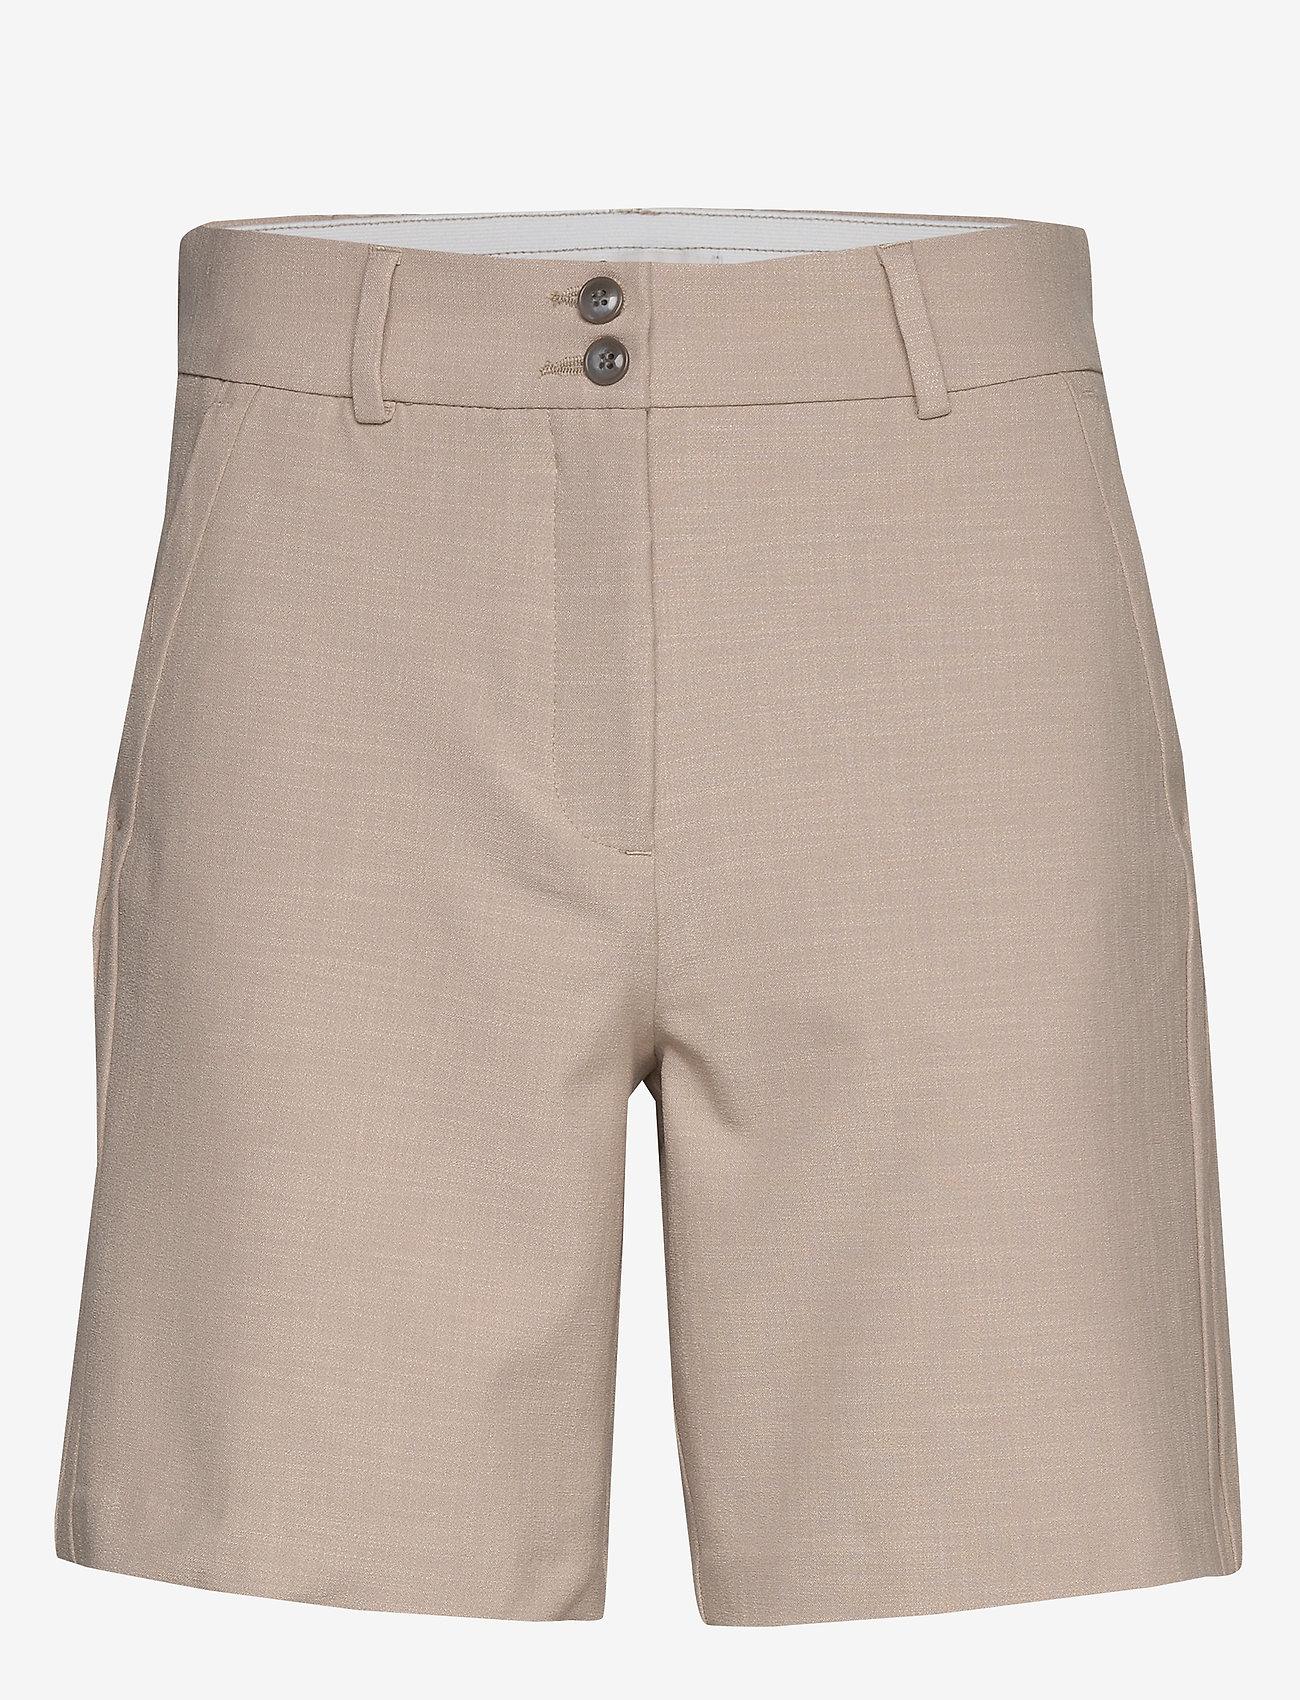 FIVEUNITS - Daphne 396 Plaza Teardrops - casual shorts - plaza teardrops - 0